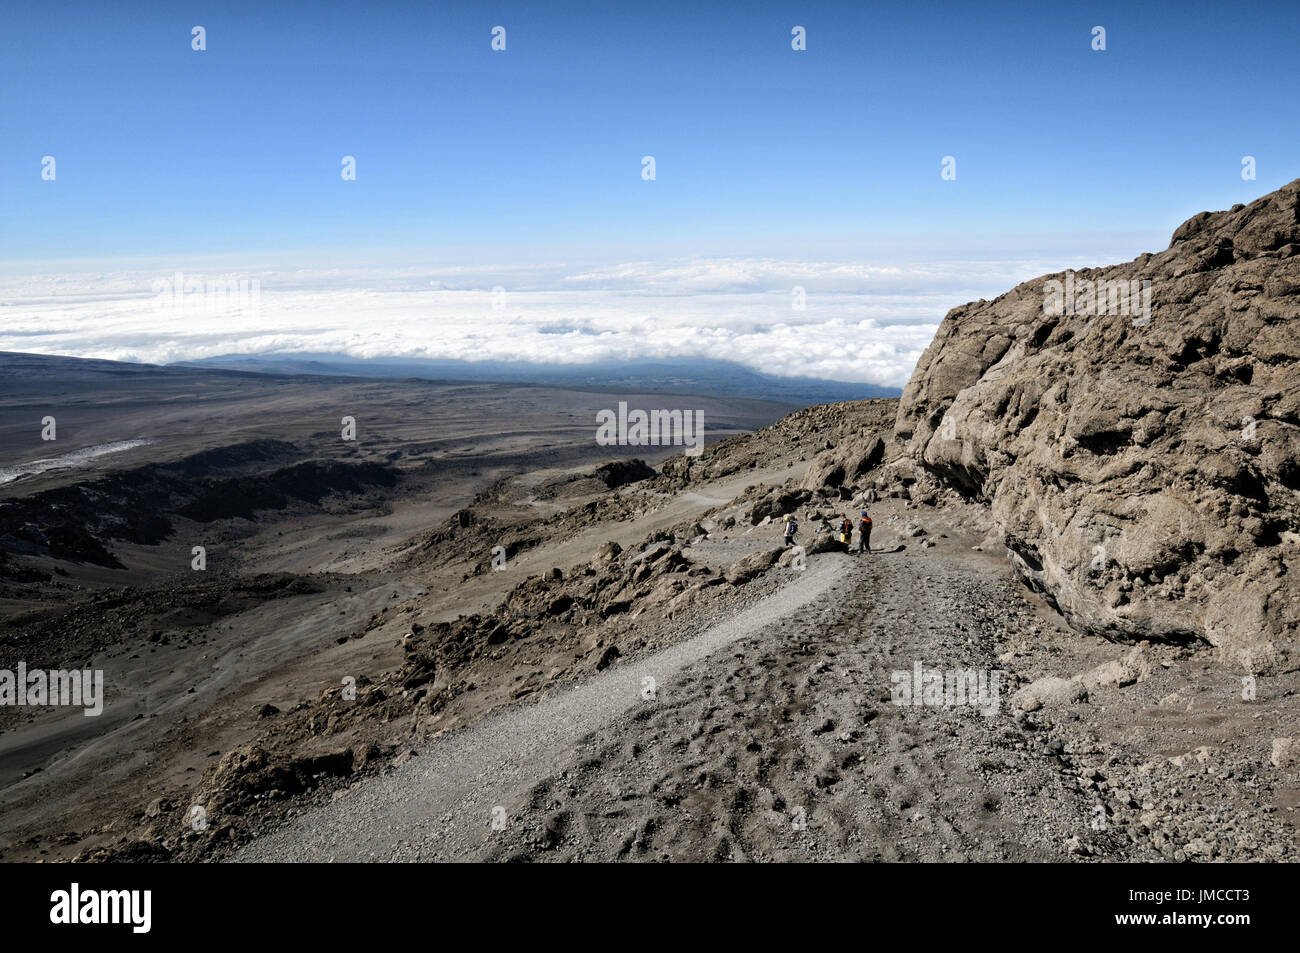 Descent route from Uhuru Peak to Barafu Camp, Kilimanjaro National Park, Tanzania Stock Photo